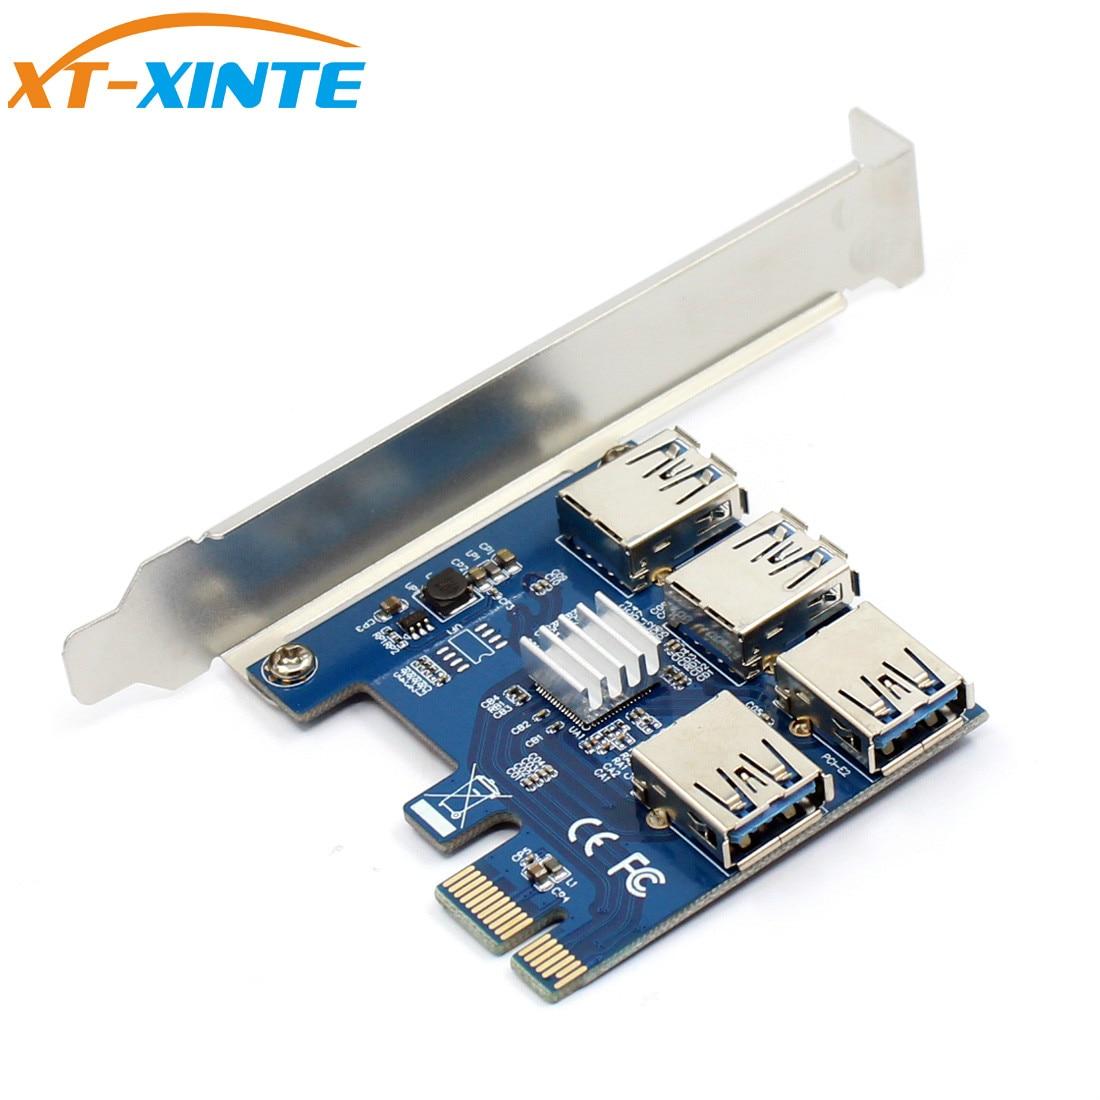 60 cm PCIe 1 zu 4 PCIe 16X Riser Karte PCI-E 1X zu 4 USB 3.0 PCI-E Riser Adapter Port Multiplier karte für BTC Bitcoin Miner Bergbau